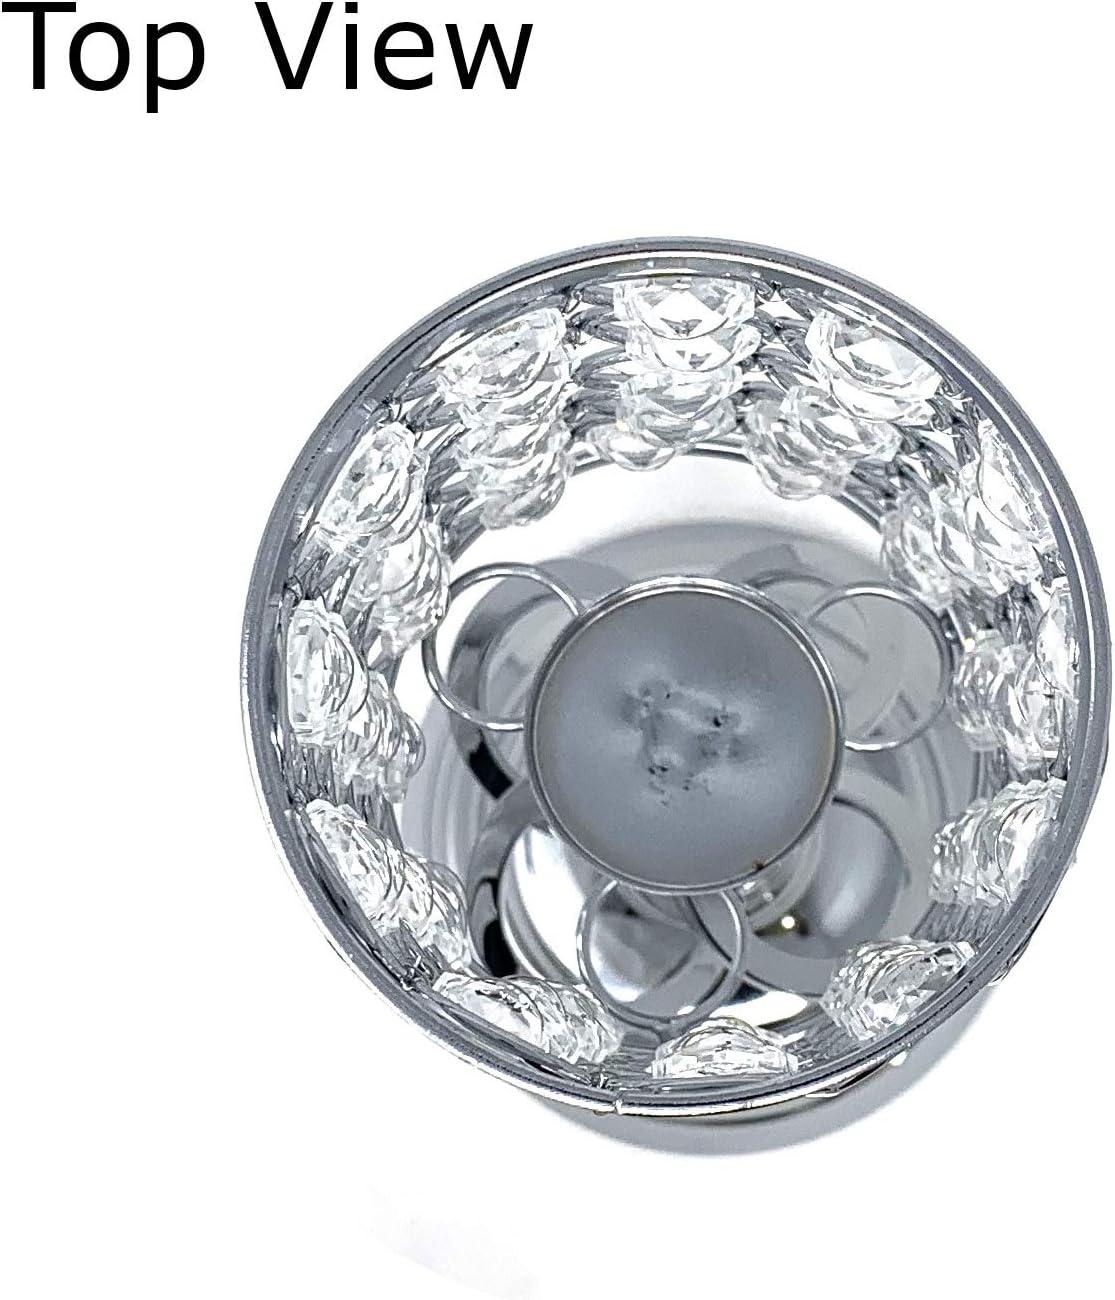 allgala 14 Crystal Gold Cylinder Tealight Votive Decorative Candle Holder